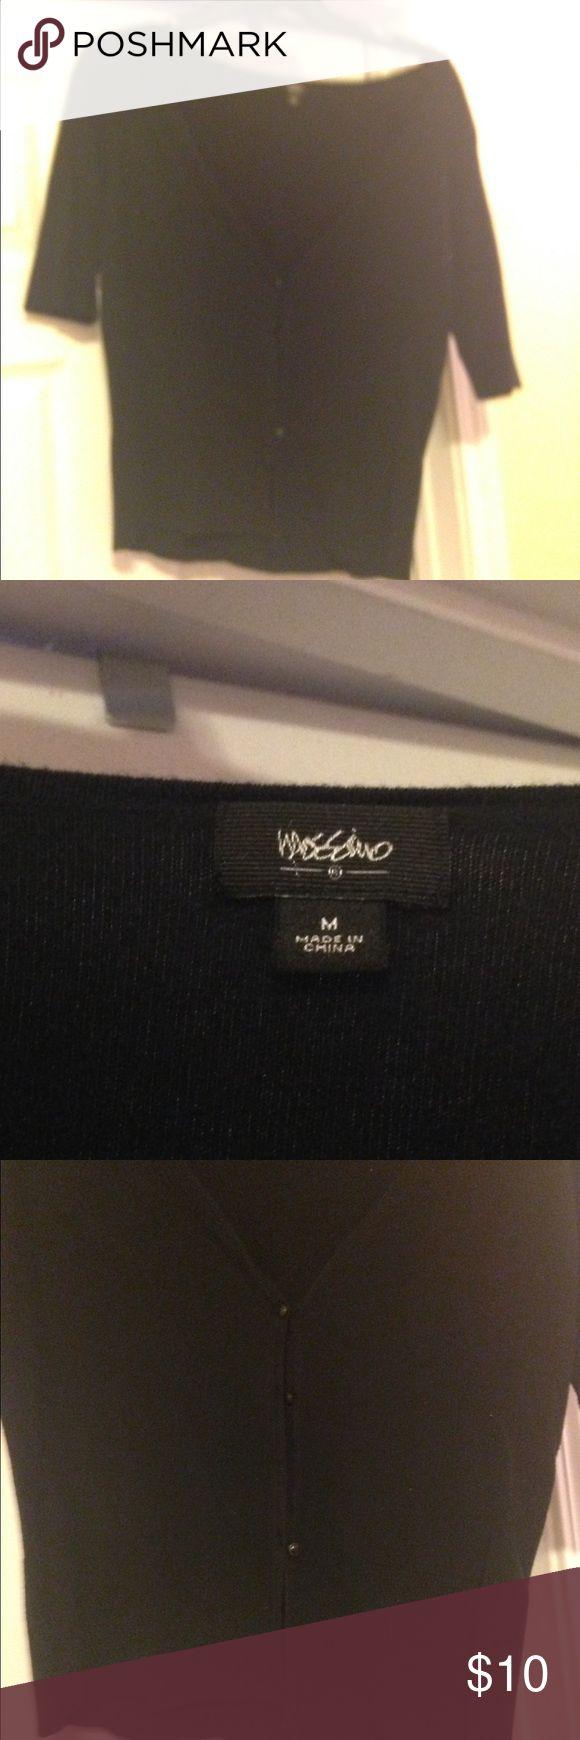 Mossimo Black V-Neck Cardigan Mossimo Black V-Neck Cardigan. Size Medium. Perfect condition. Mossimo Supply Co Sweaters Cardigans